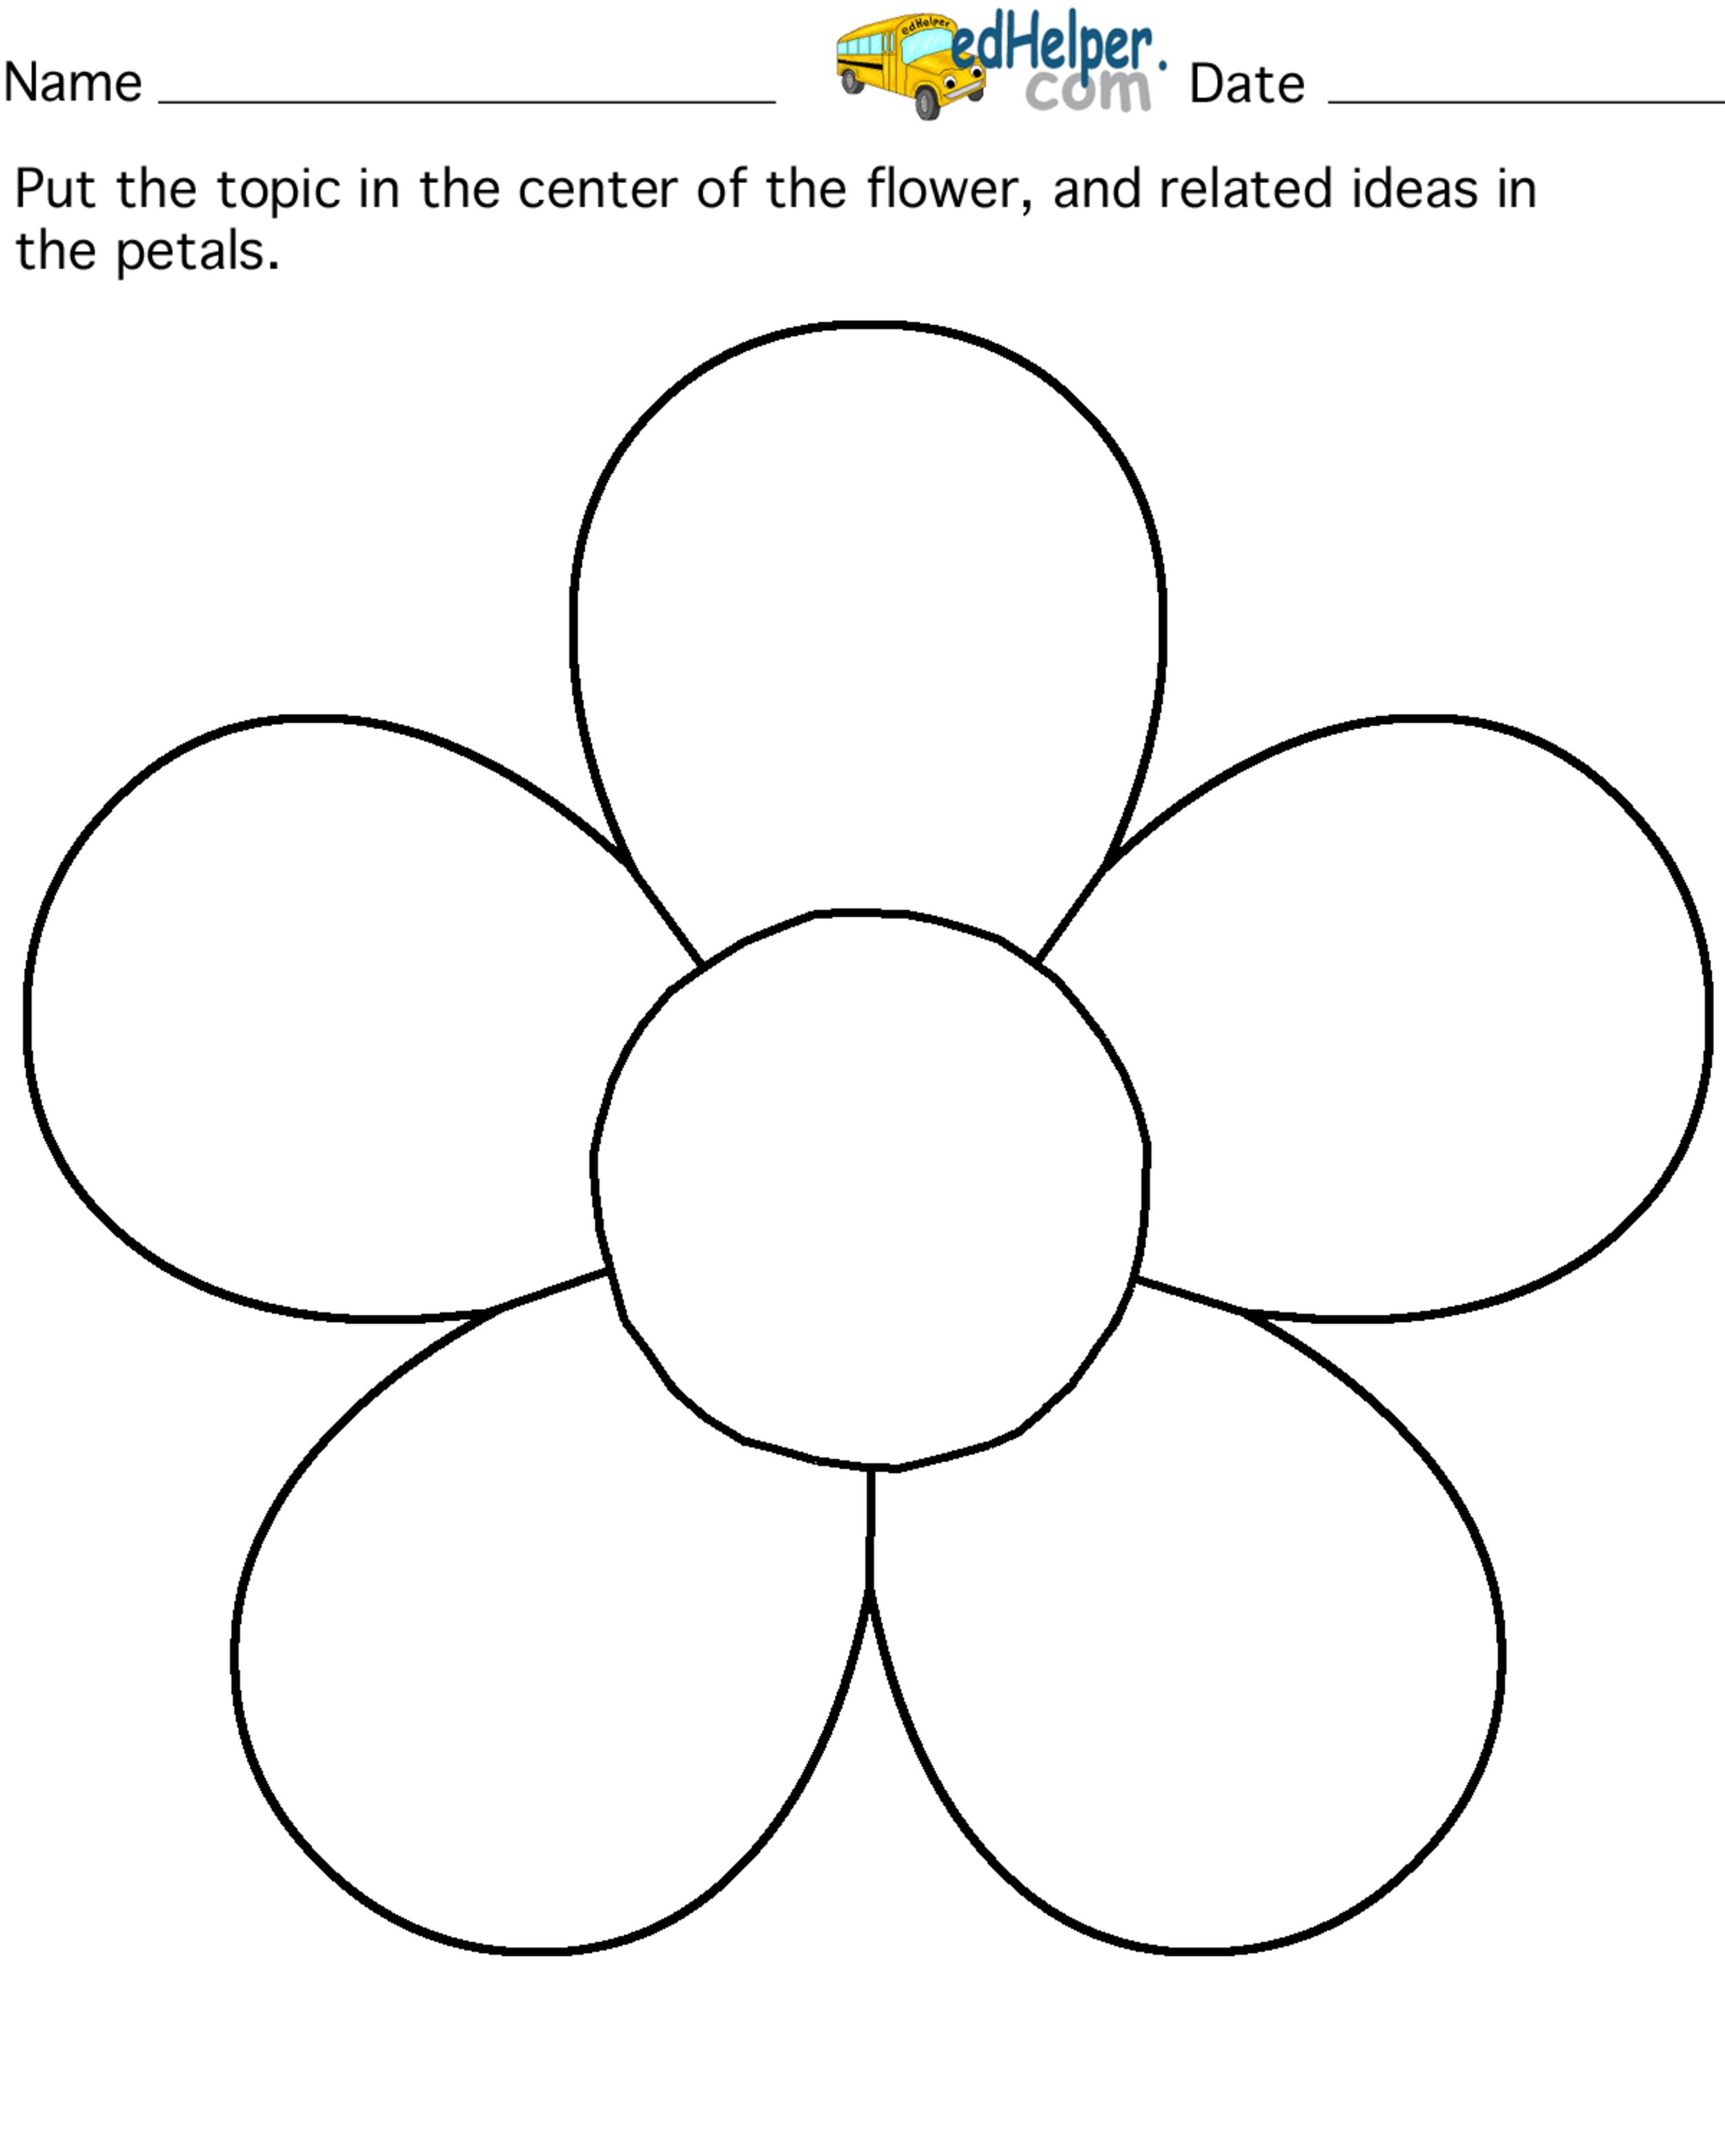 flower templates for coloring spring flower coloring pages flowers coloring sheet coloring templates flower for